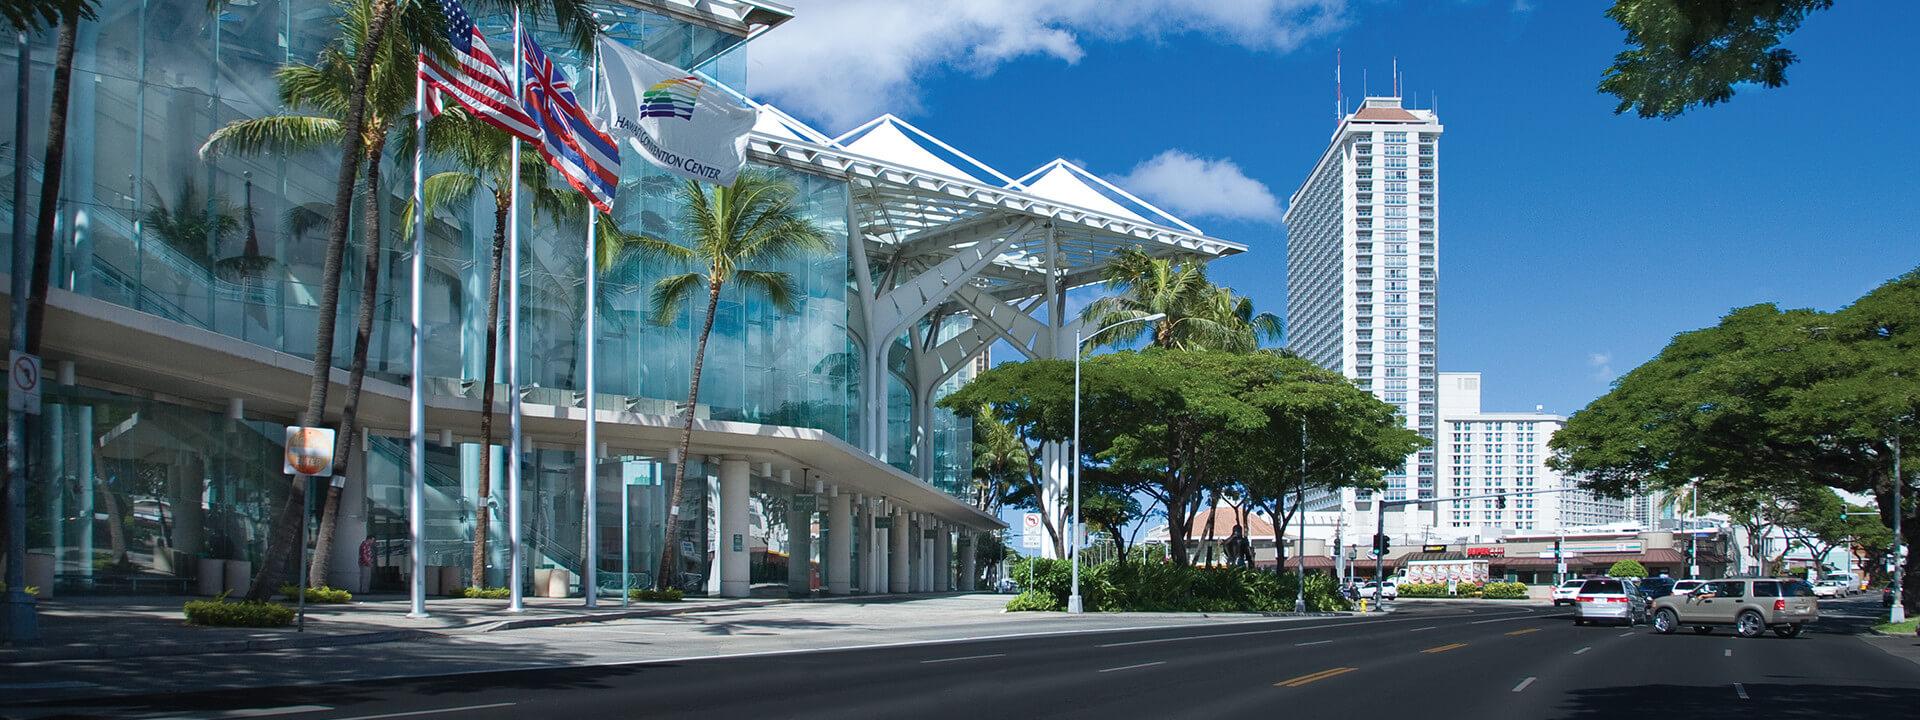 Honolulu Convention Centre.